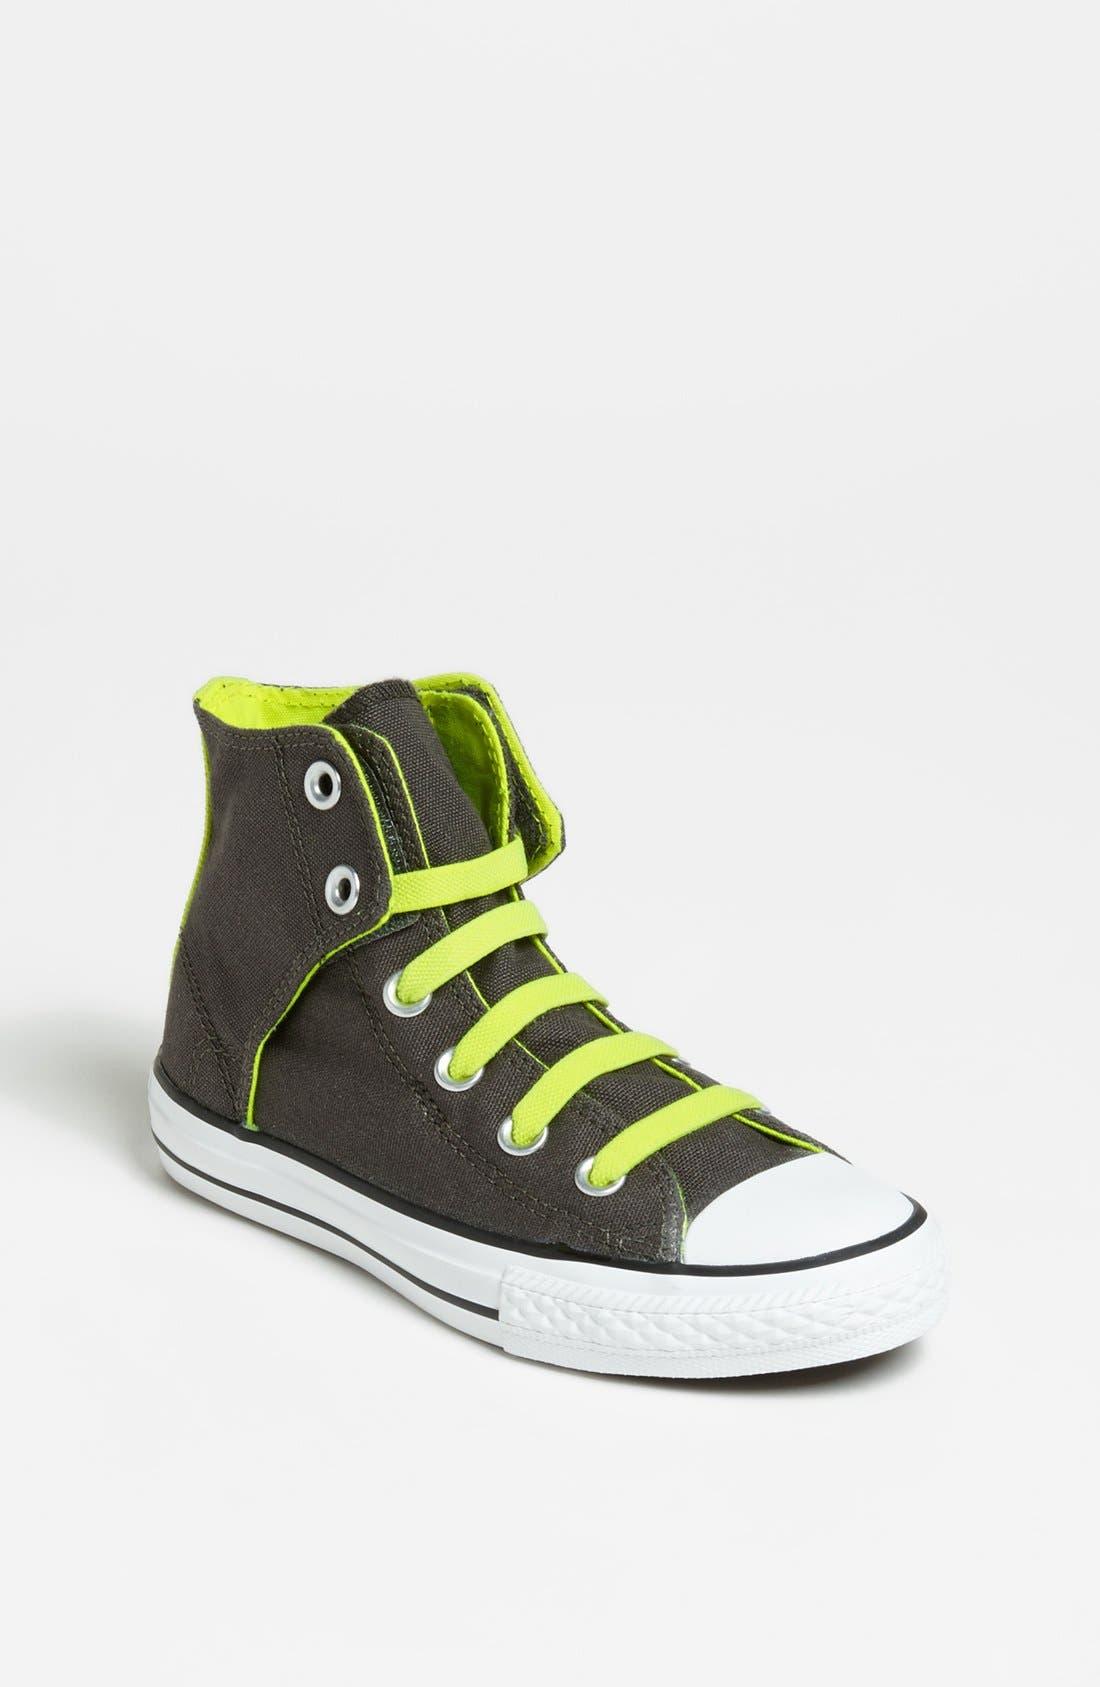 Alternate Image 1 Selected - Converse Chuck Taylor® 'Easy Slip' Sneaker (Toddler, Little Kid & Big Kid)